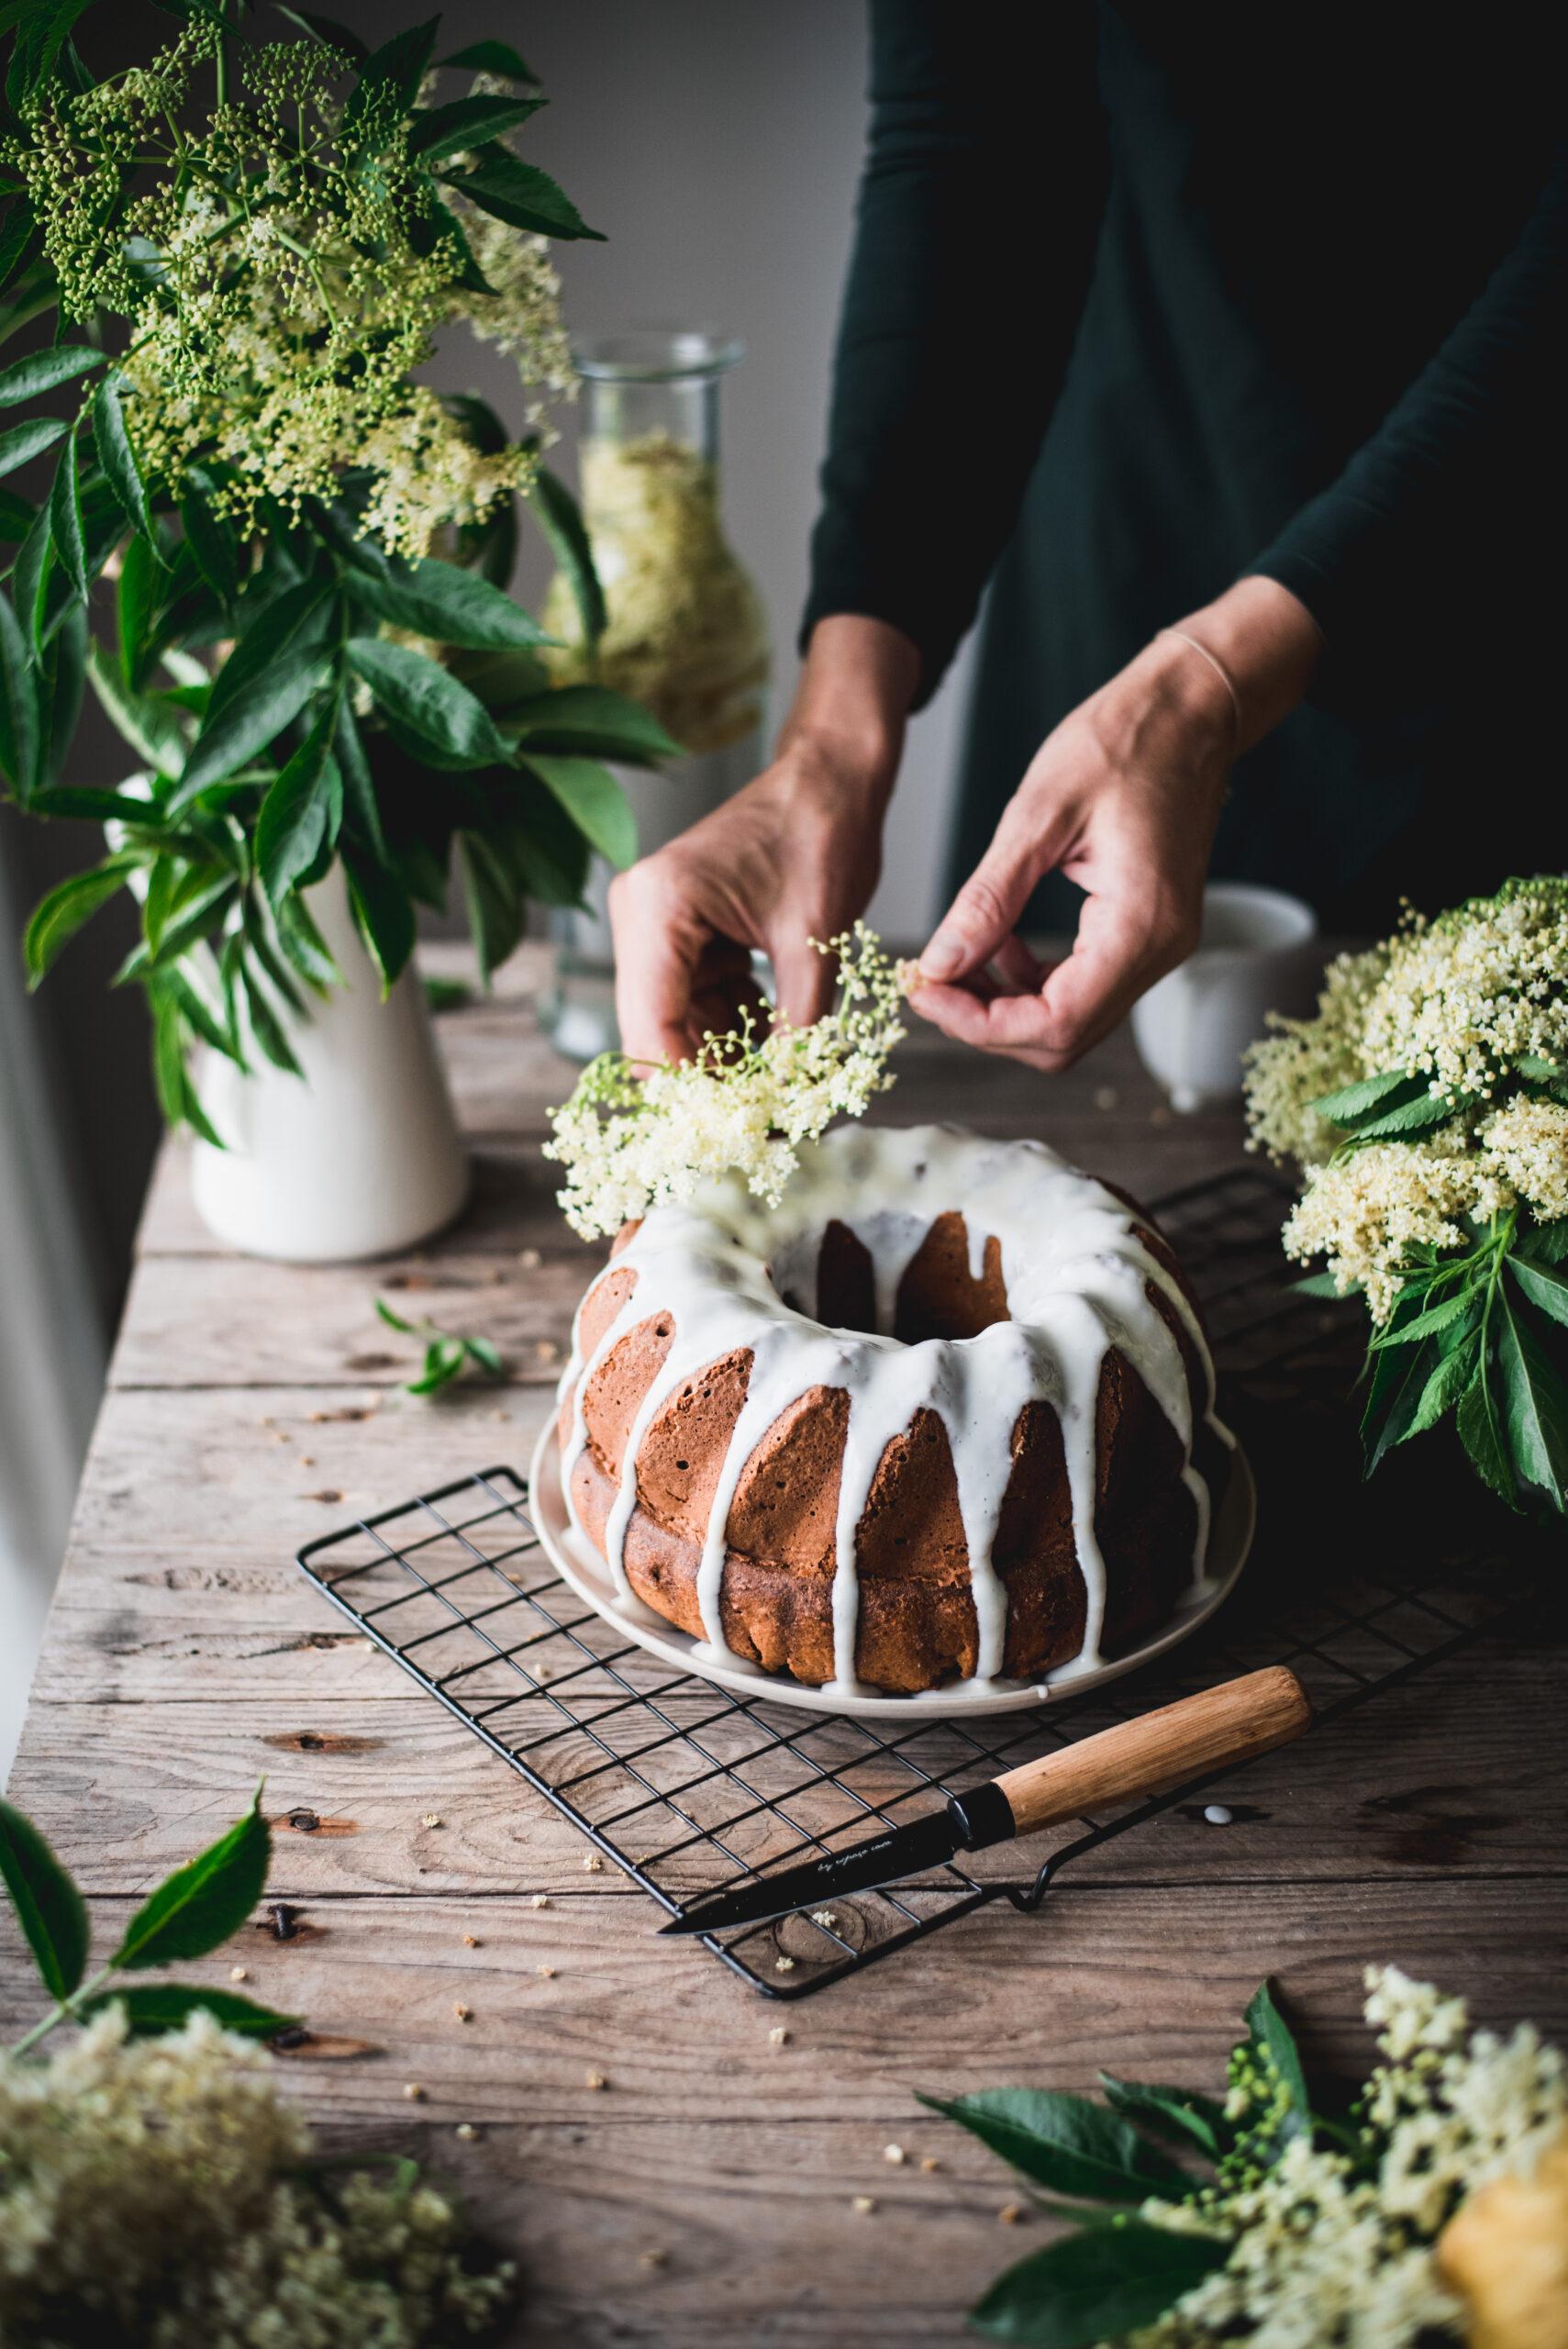 Decorating a delicious Elderflower Bundt Cake with more Elderflowers